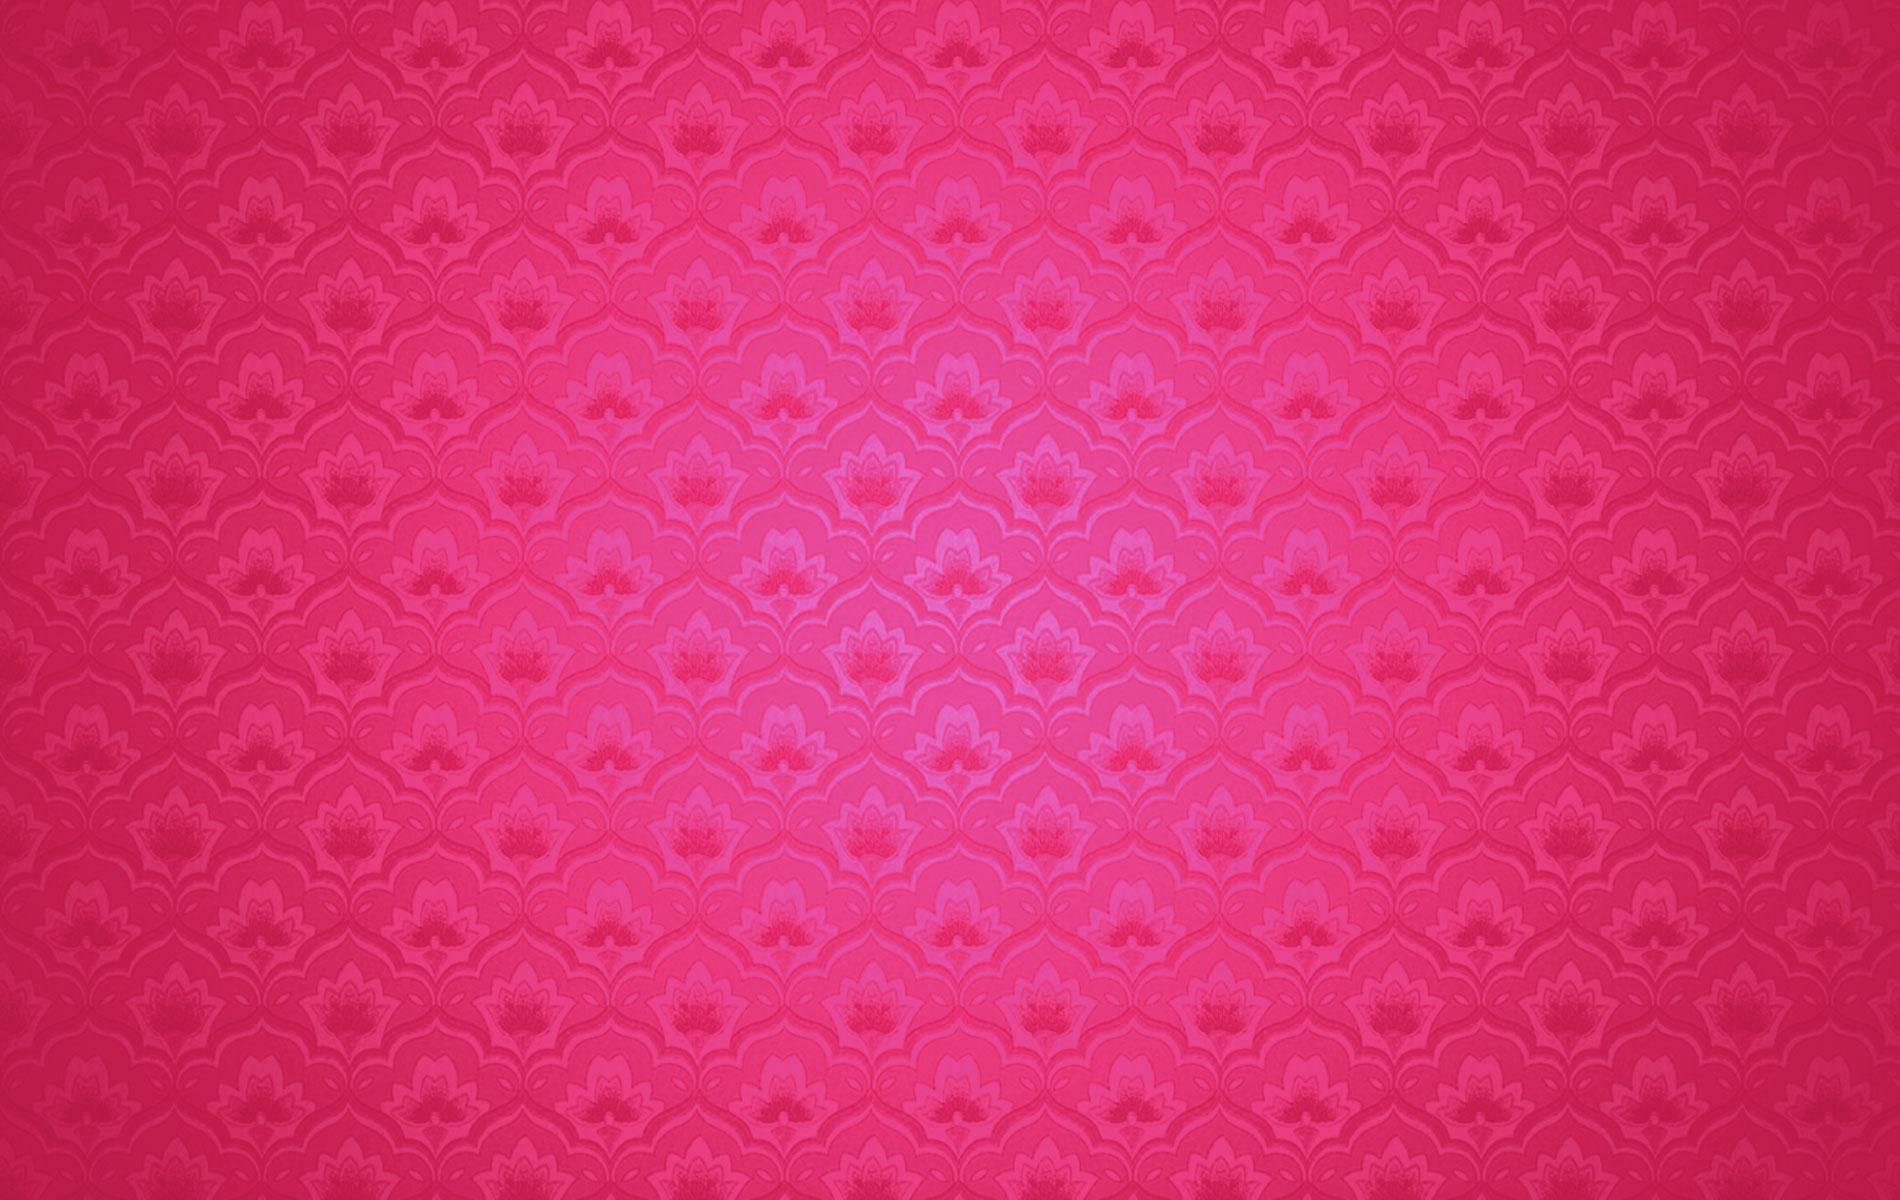 Light Pink Background Wallpaper